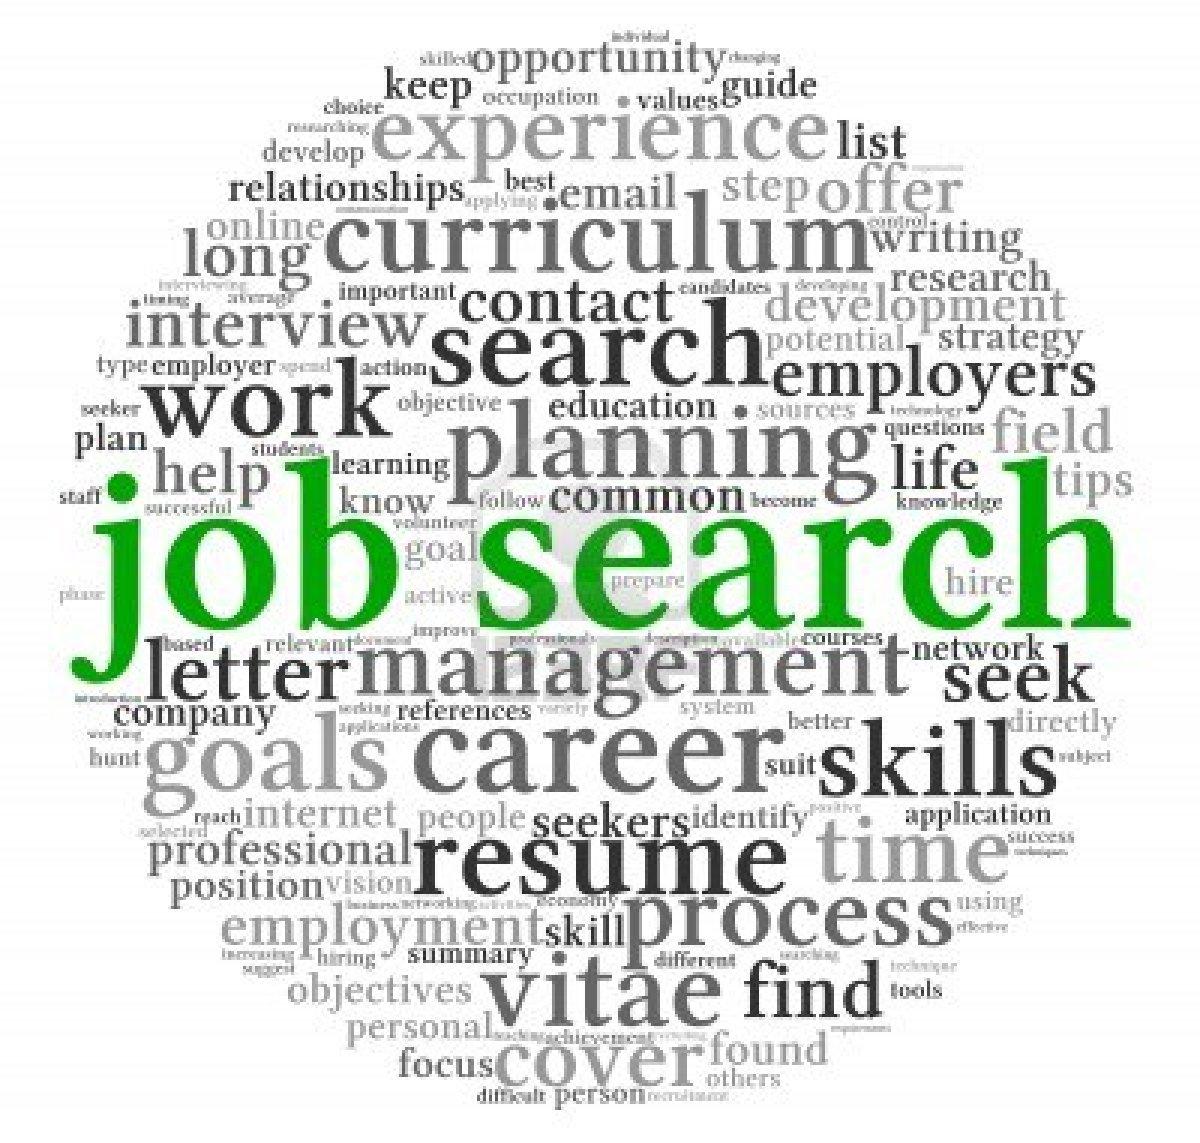 indeed uk resume search resume maker create professional indeed uk resume search lance photographer jobs home uk job sites best job searching site job